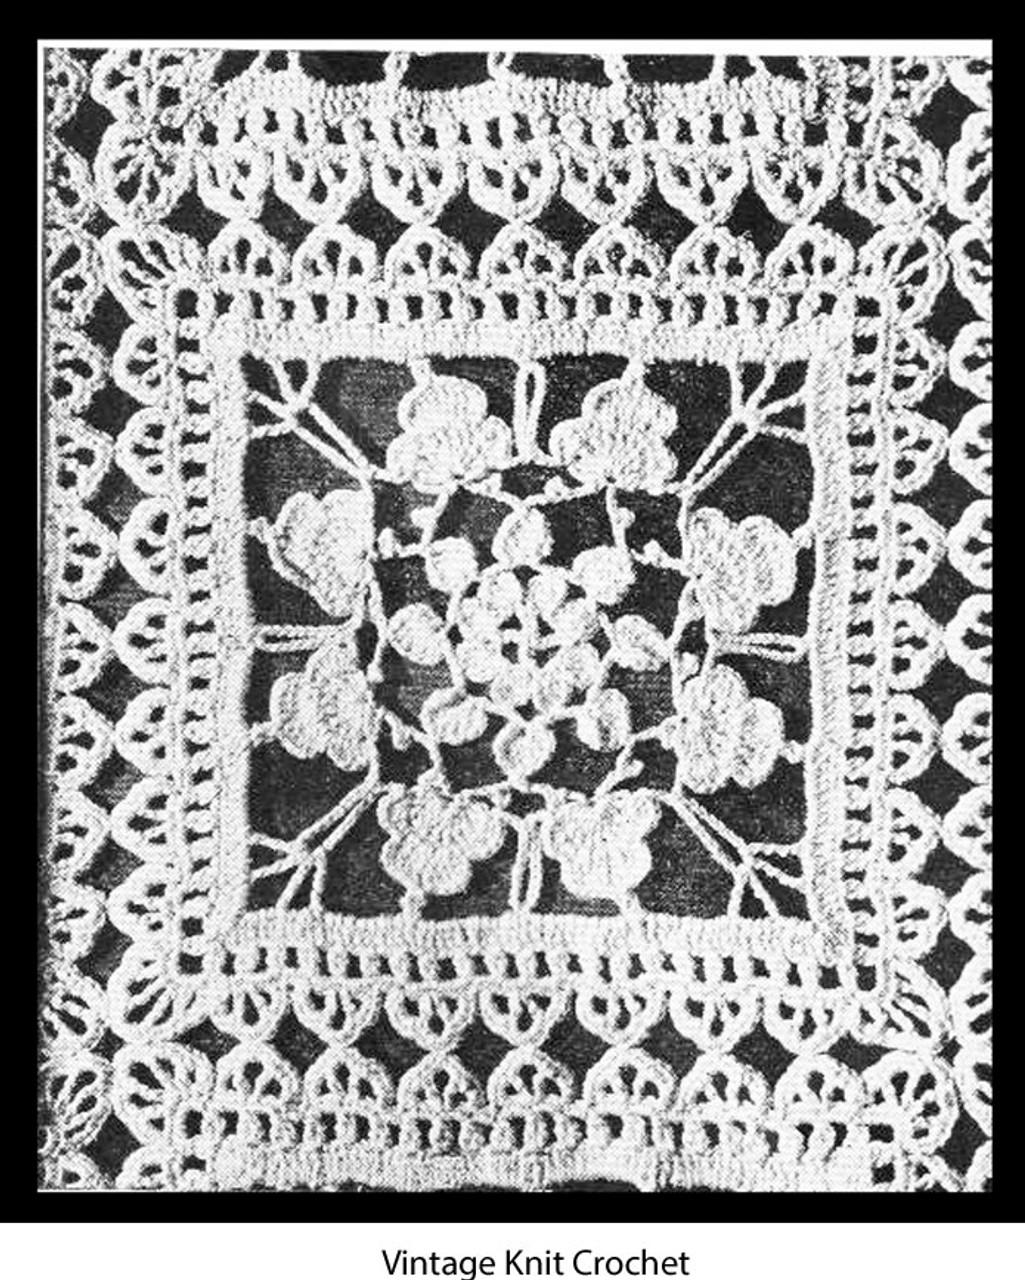 Vintage Flower Crochet Square Pattern for spreads